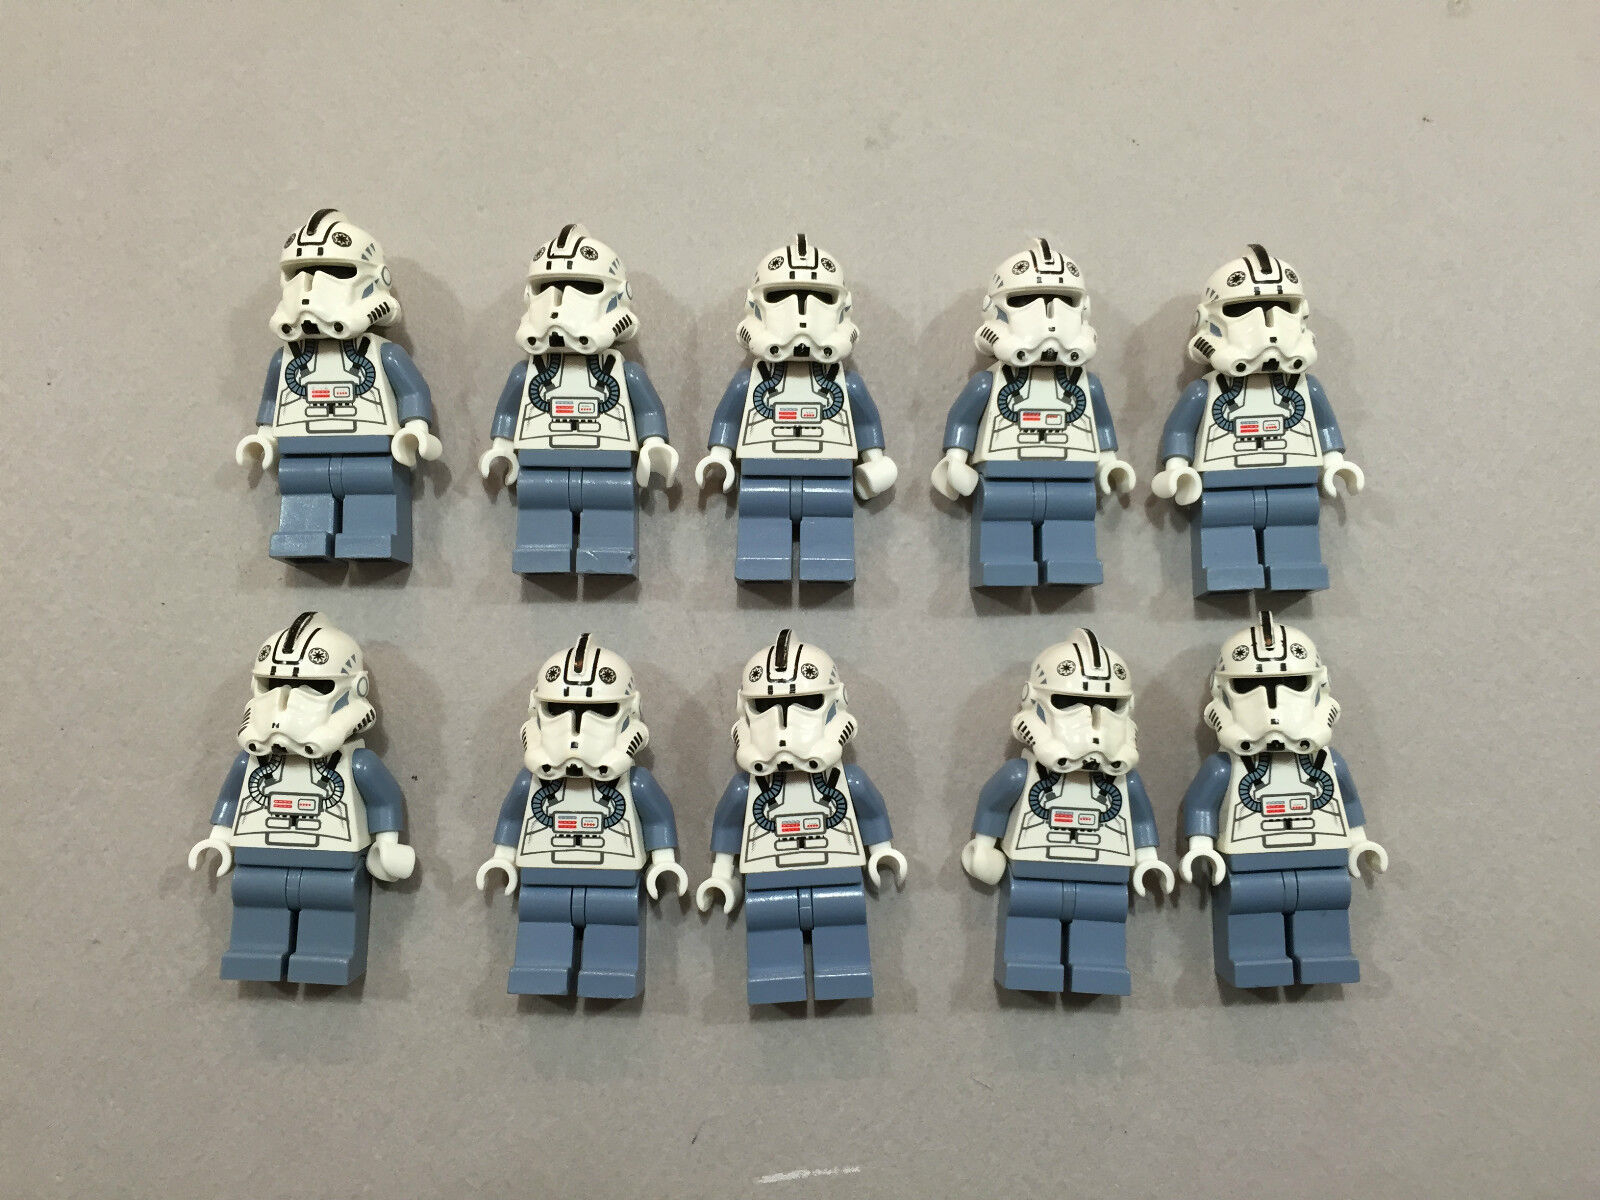 LEGO Clone Trooper Lot of 10 Star Wars Wars Wars Minifigure minifig Huge LOT Clones T139 63a6a8